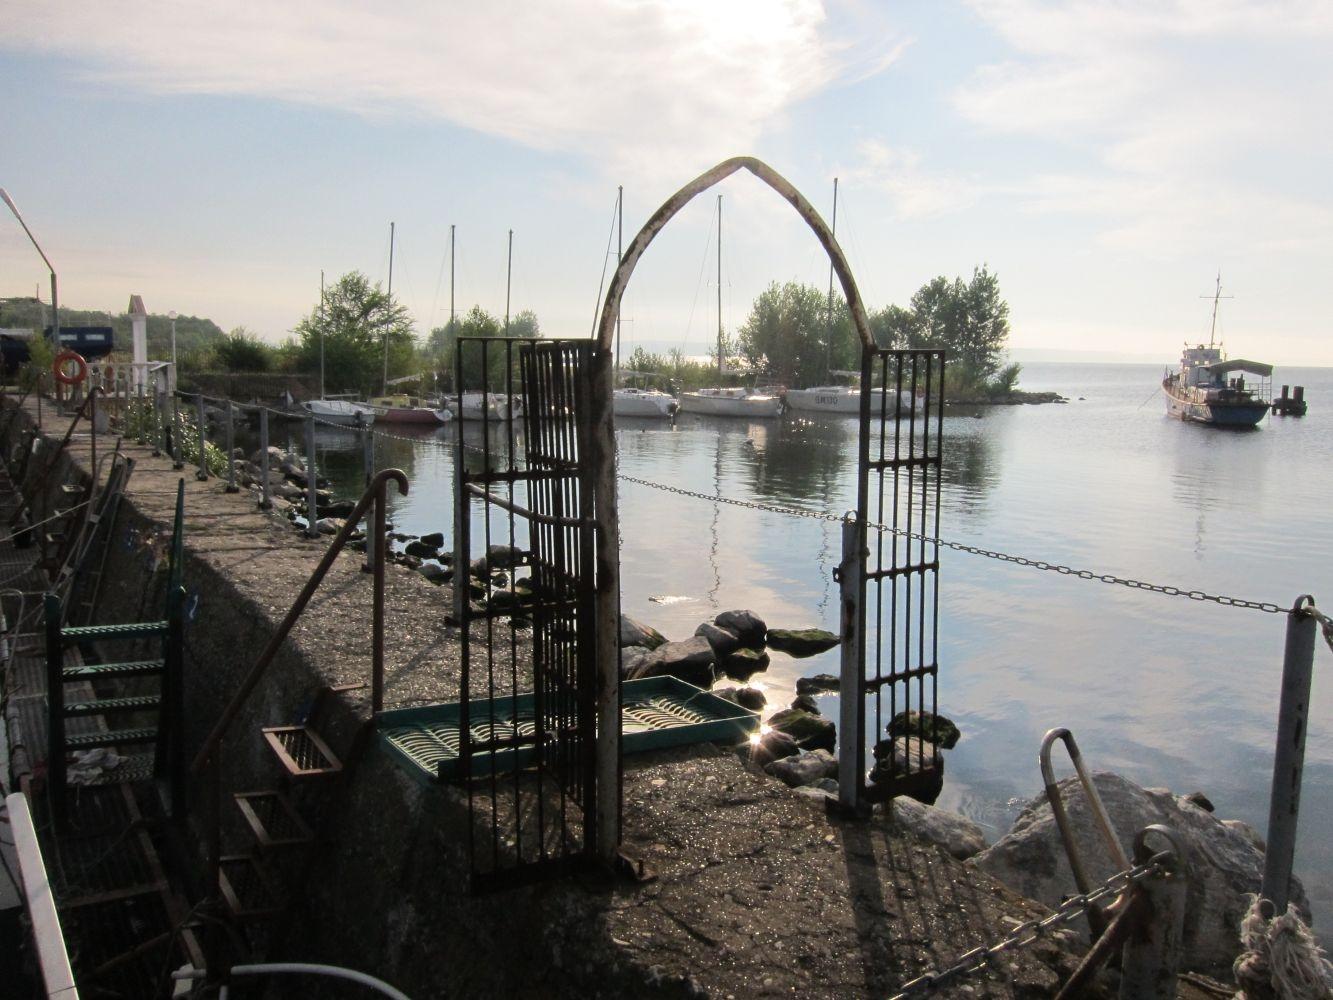 Ulyanov'sk yacht club